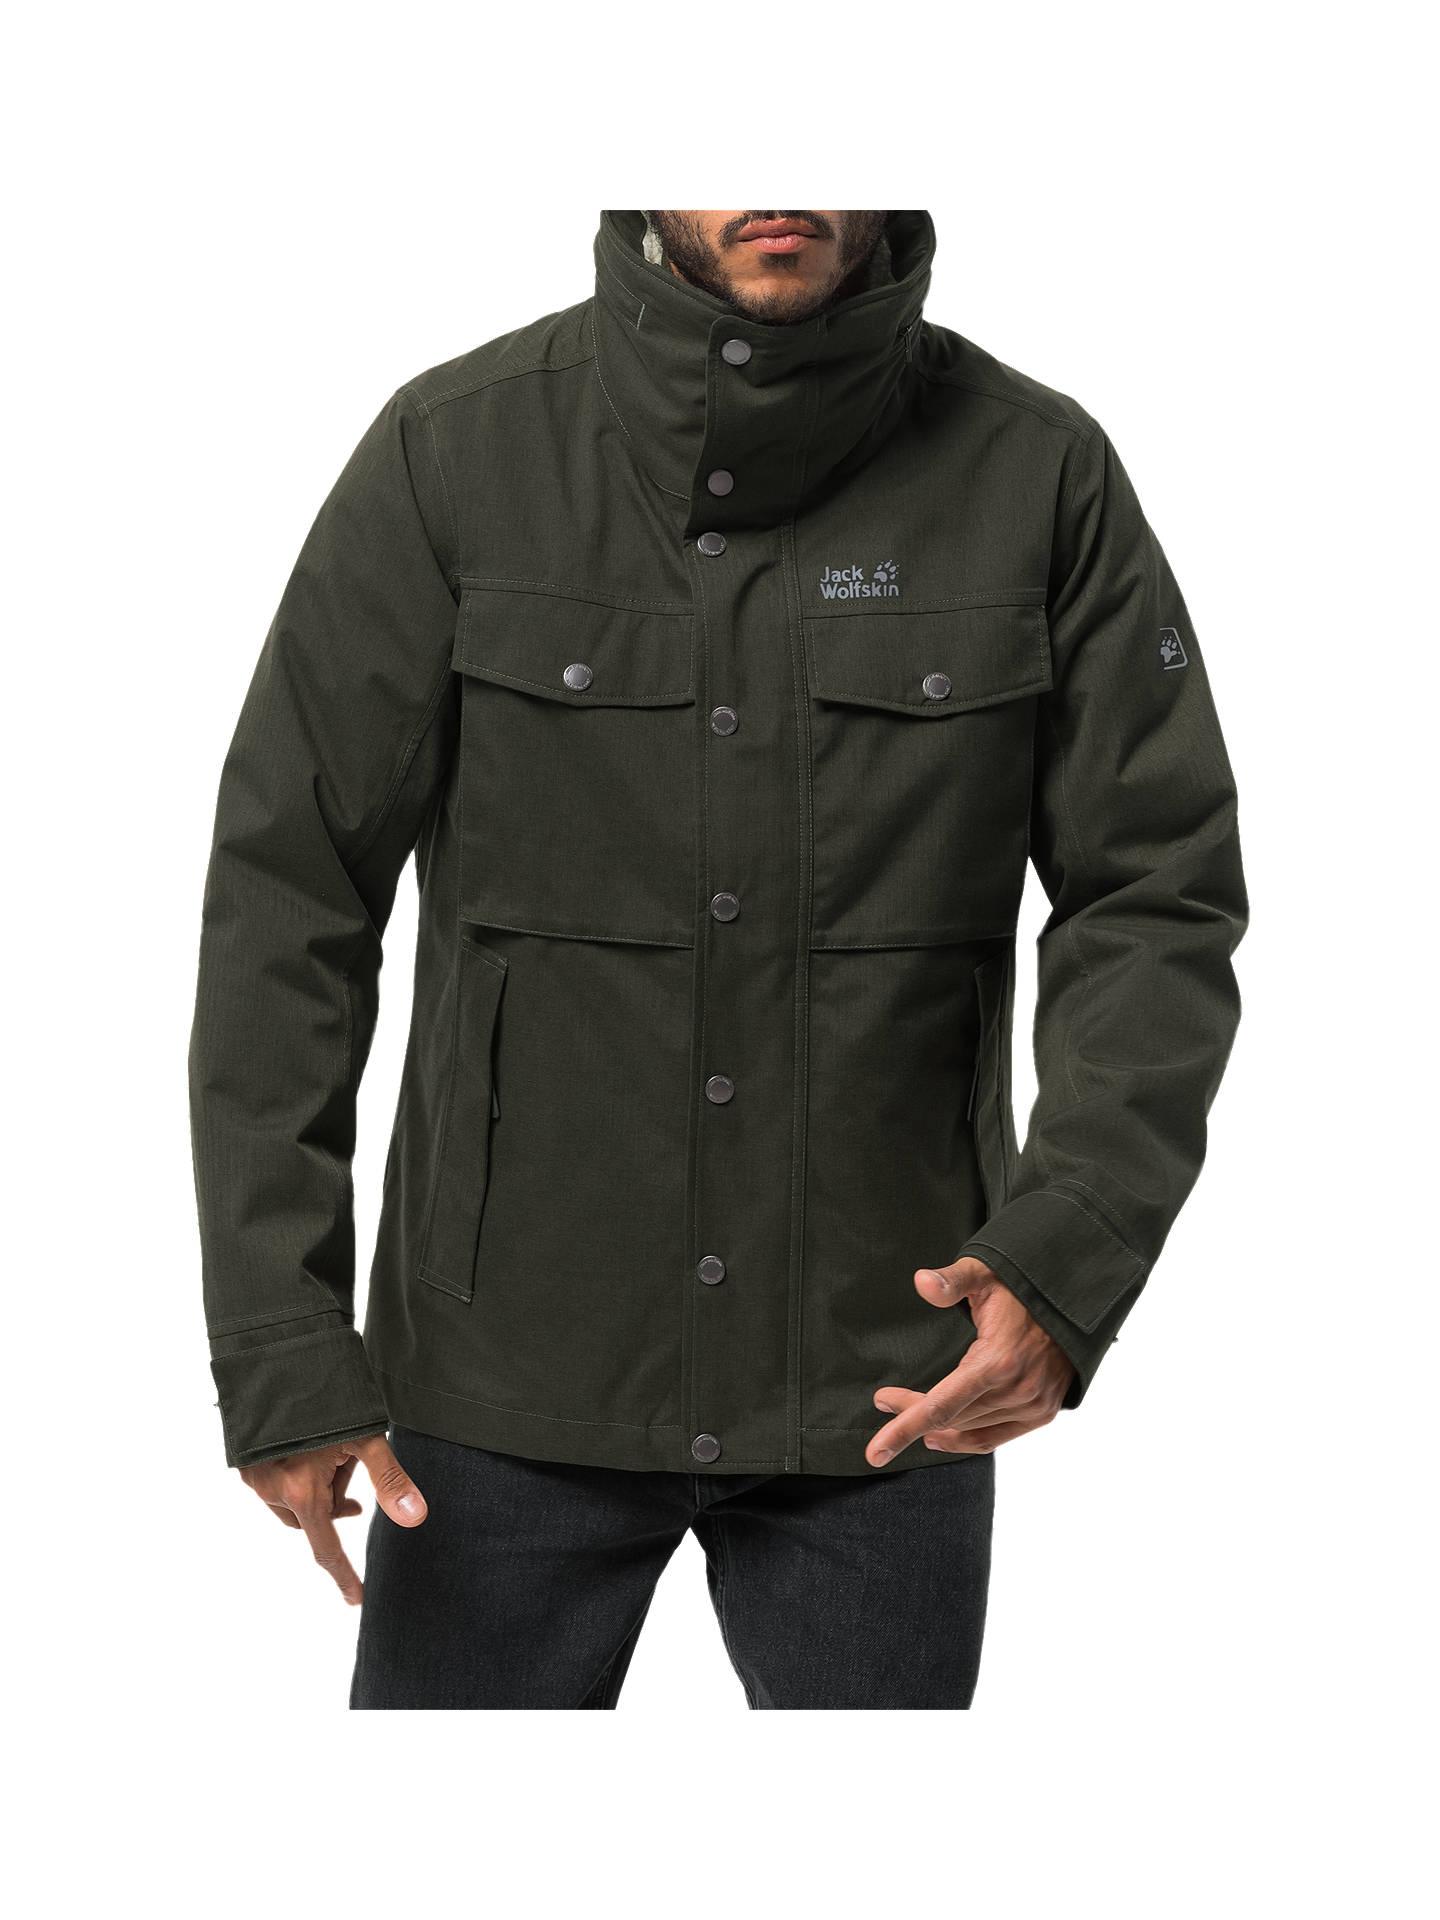 545b150de30 Buy Jack Wolfskin Fraser Canyon Men's Waterproof Jacket, Pinewood, S Online  at johnlewis.